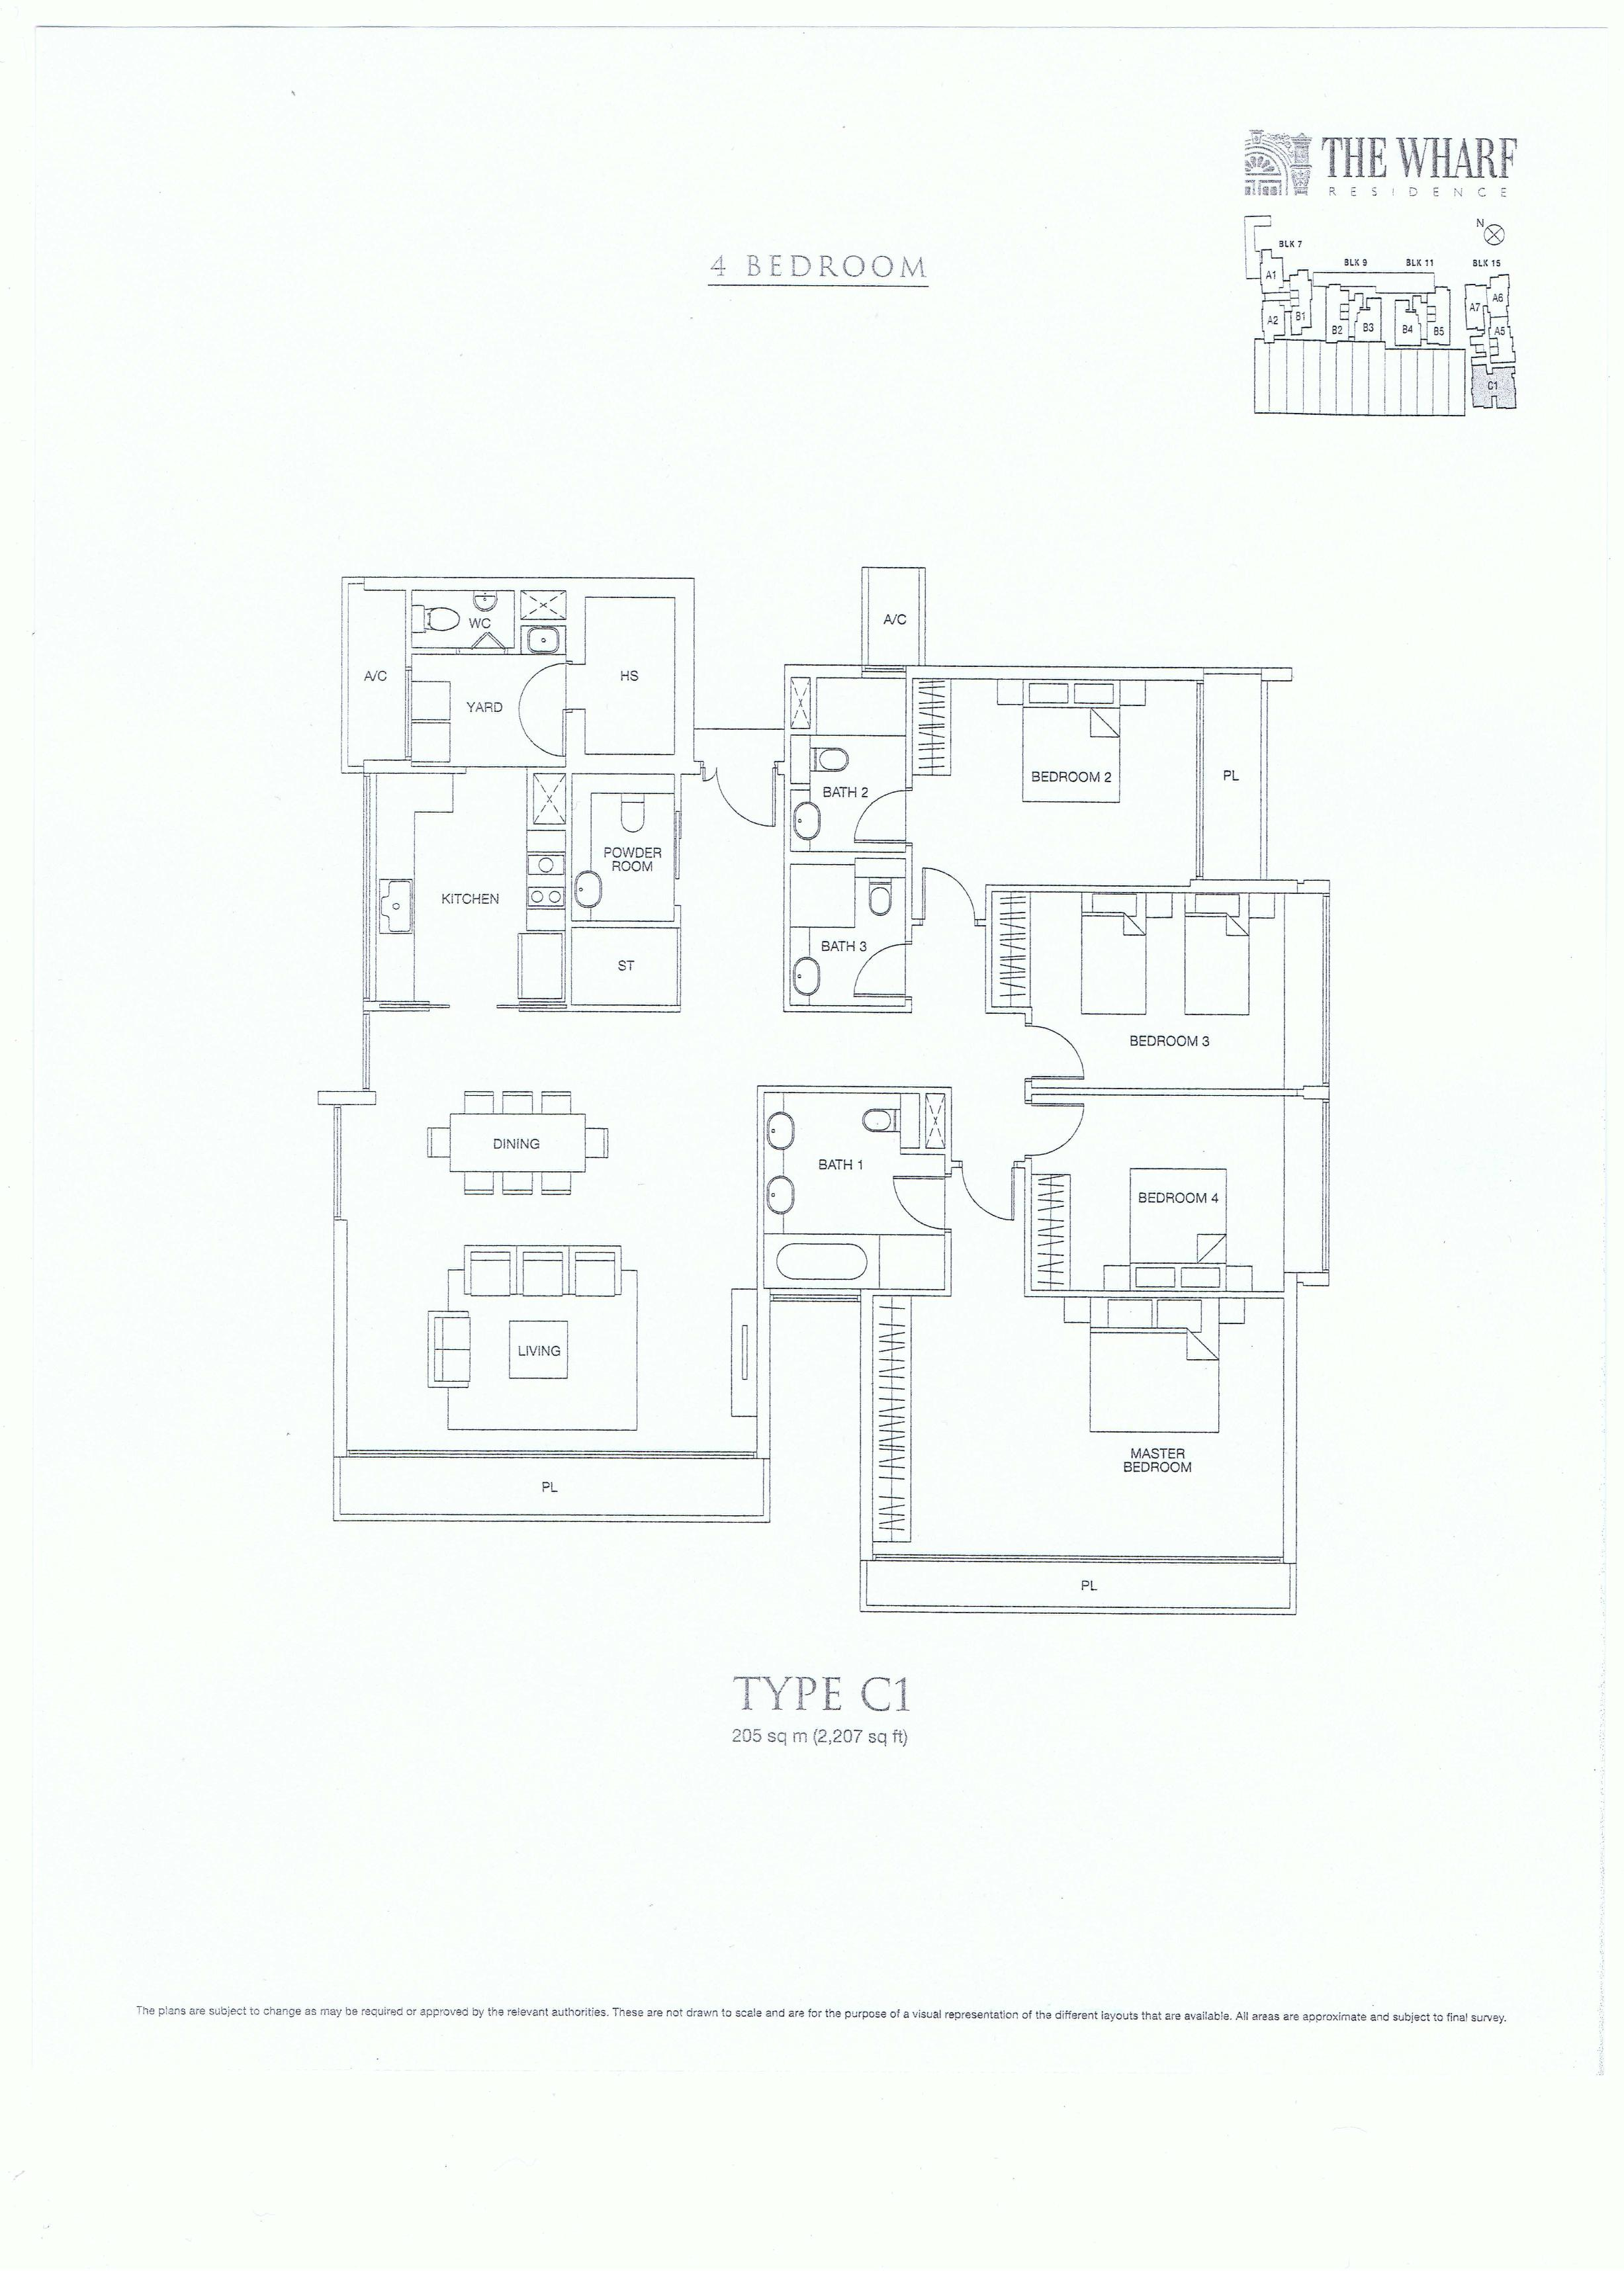 The Wharf Residence 4 Bedroom Floor Plans Type C1